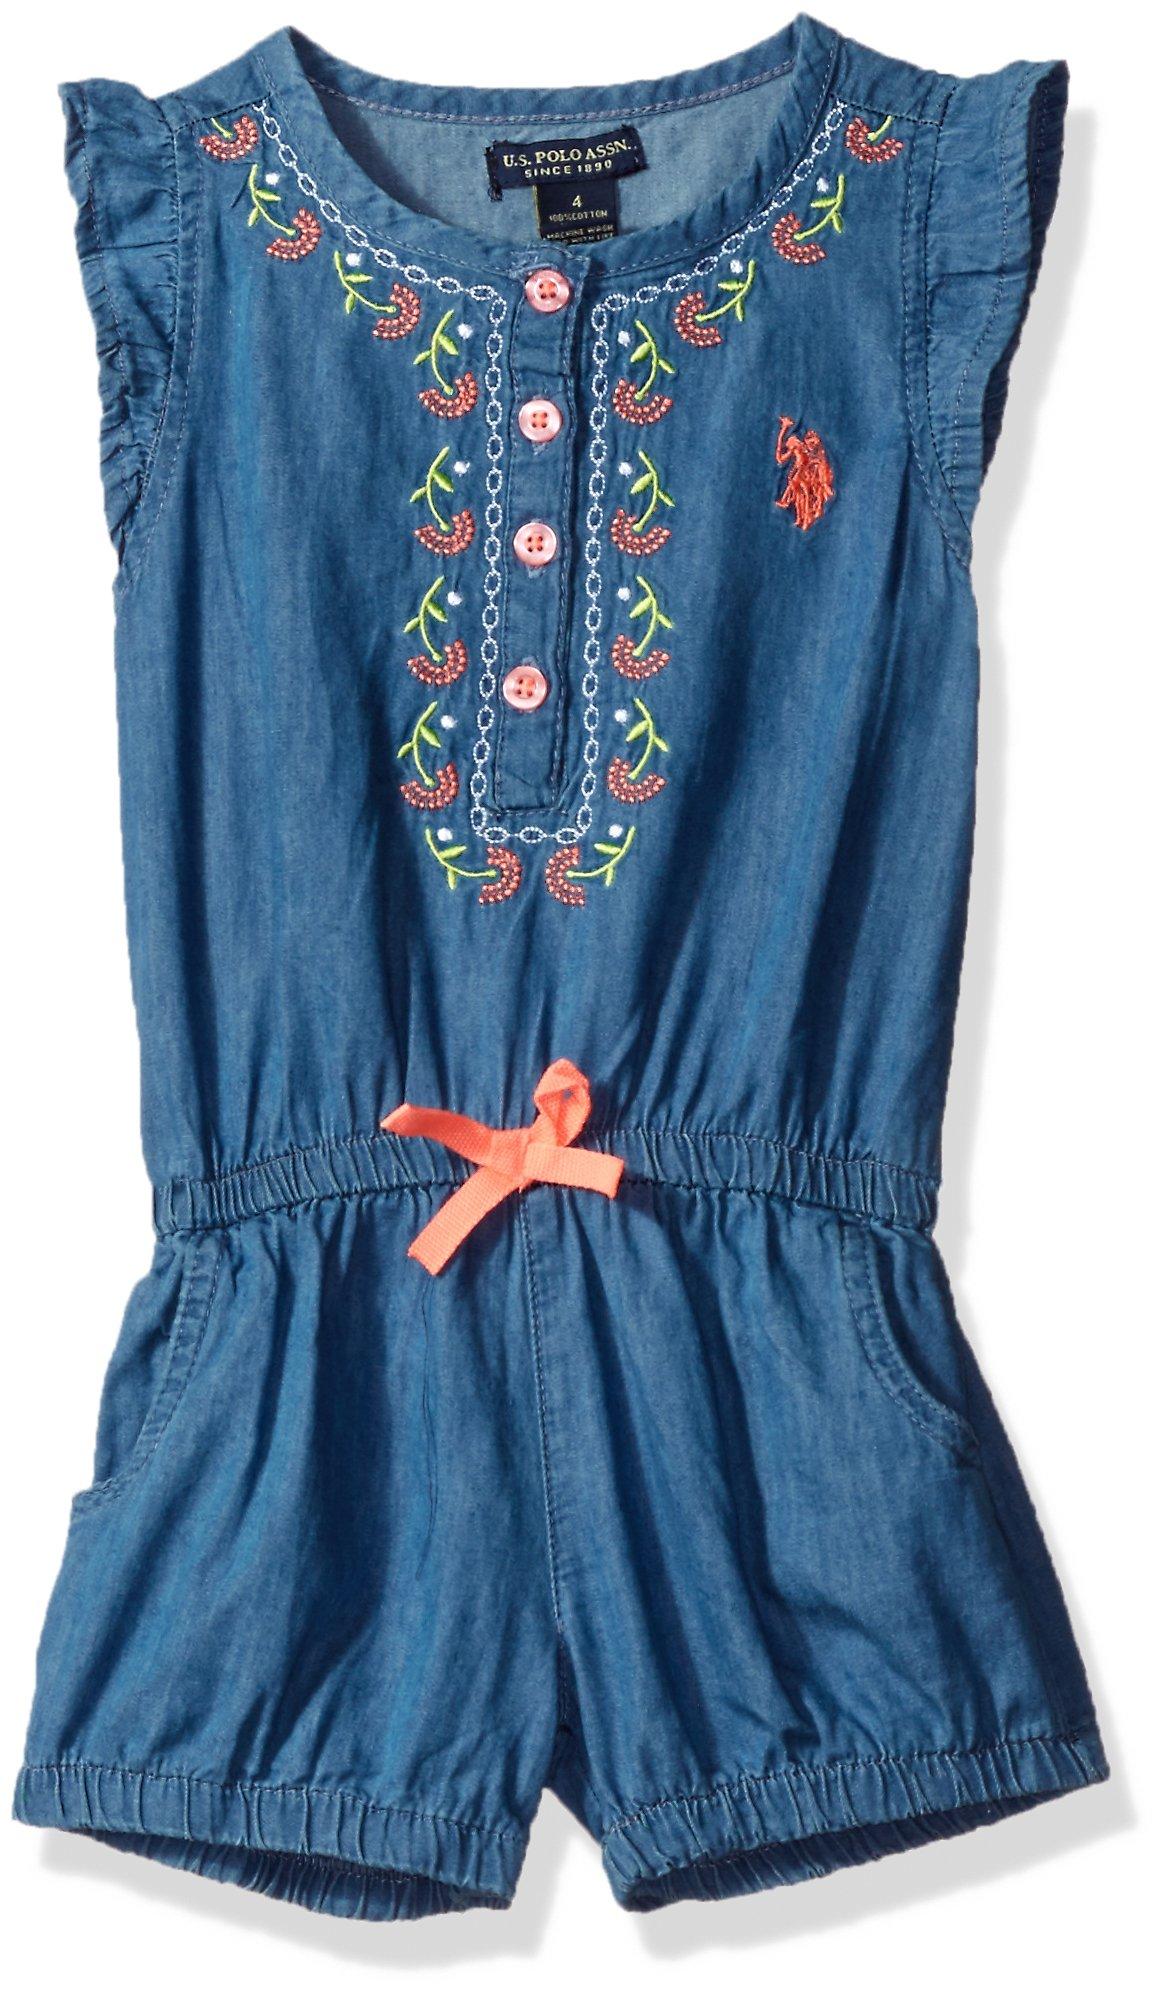 U.S. Polo Assn. Toddler Girls' Flutter Sleeve Henley Denim Romper, Light Wash, 3T